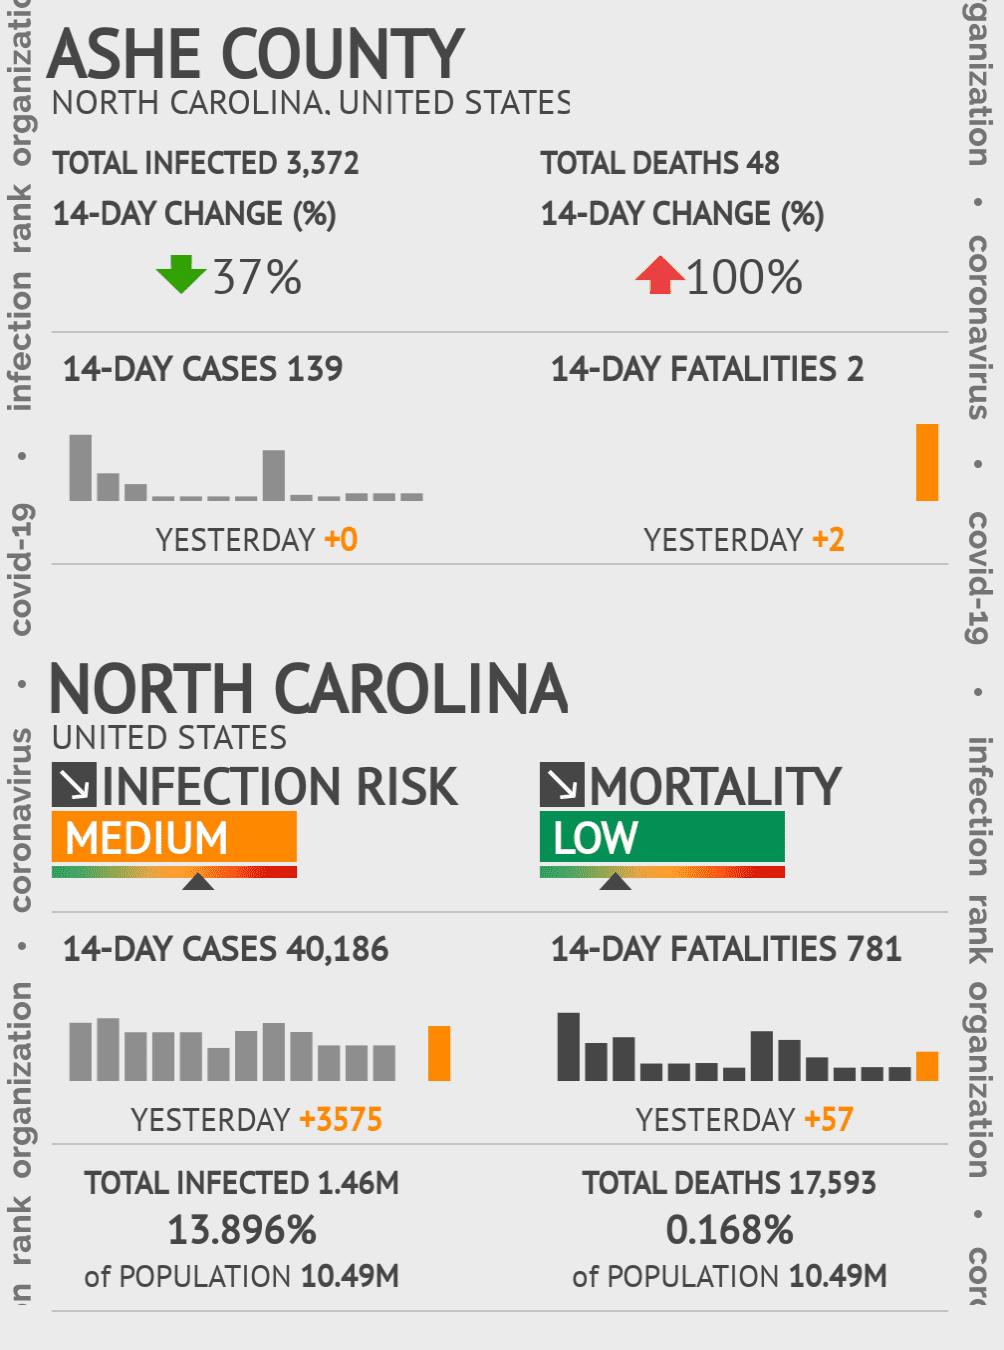 Ashe County Coronavirus Covid-19 Risk of Infection on November 30, 2020